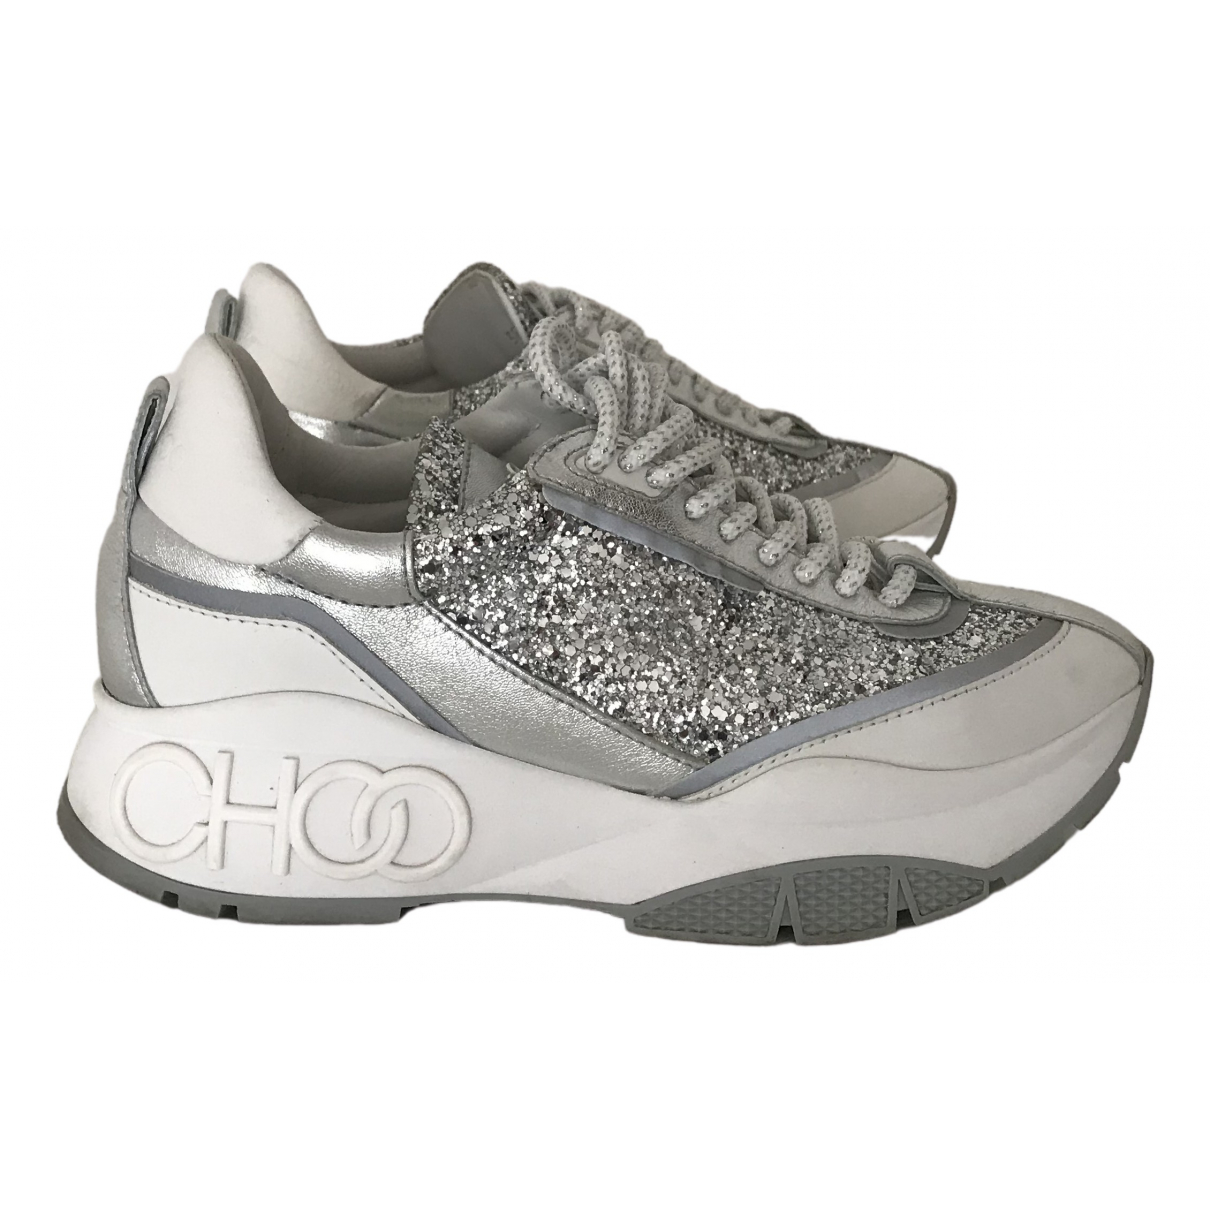 Jimmy Choo \N Silver Glitter Trainers for Women 38.5 EU